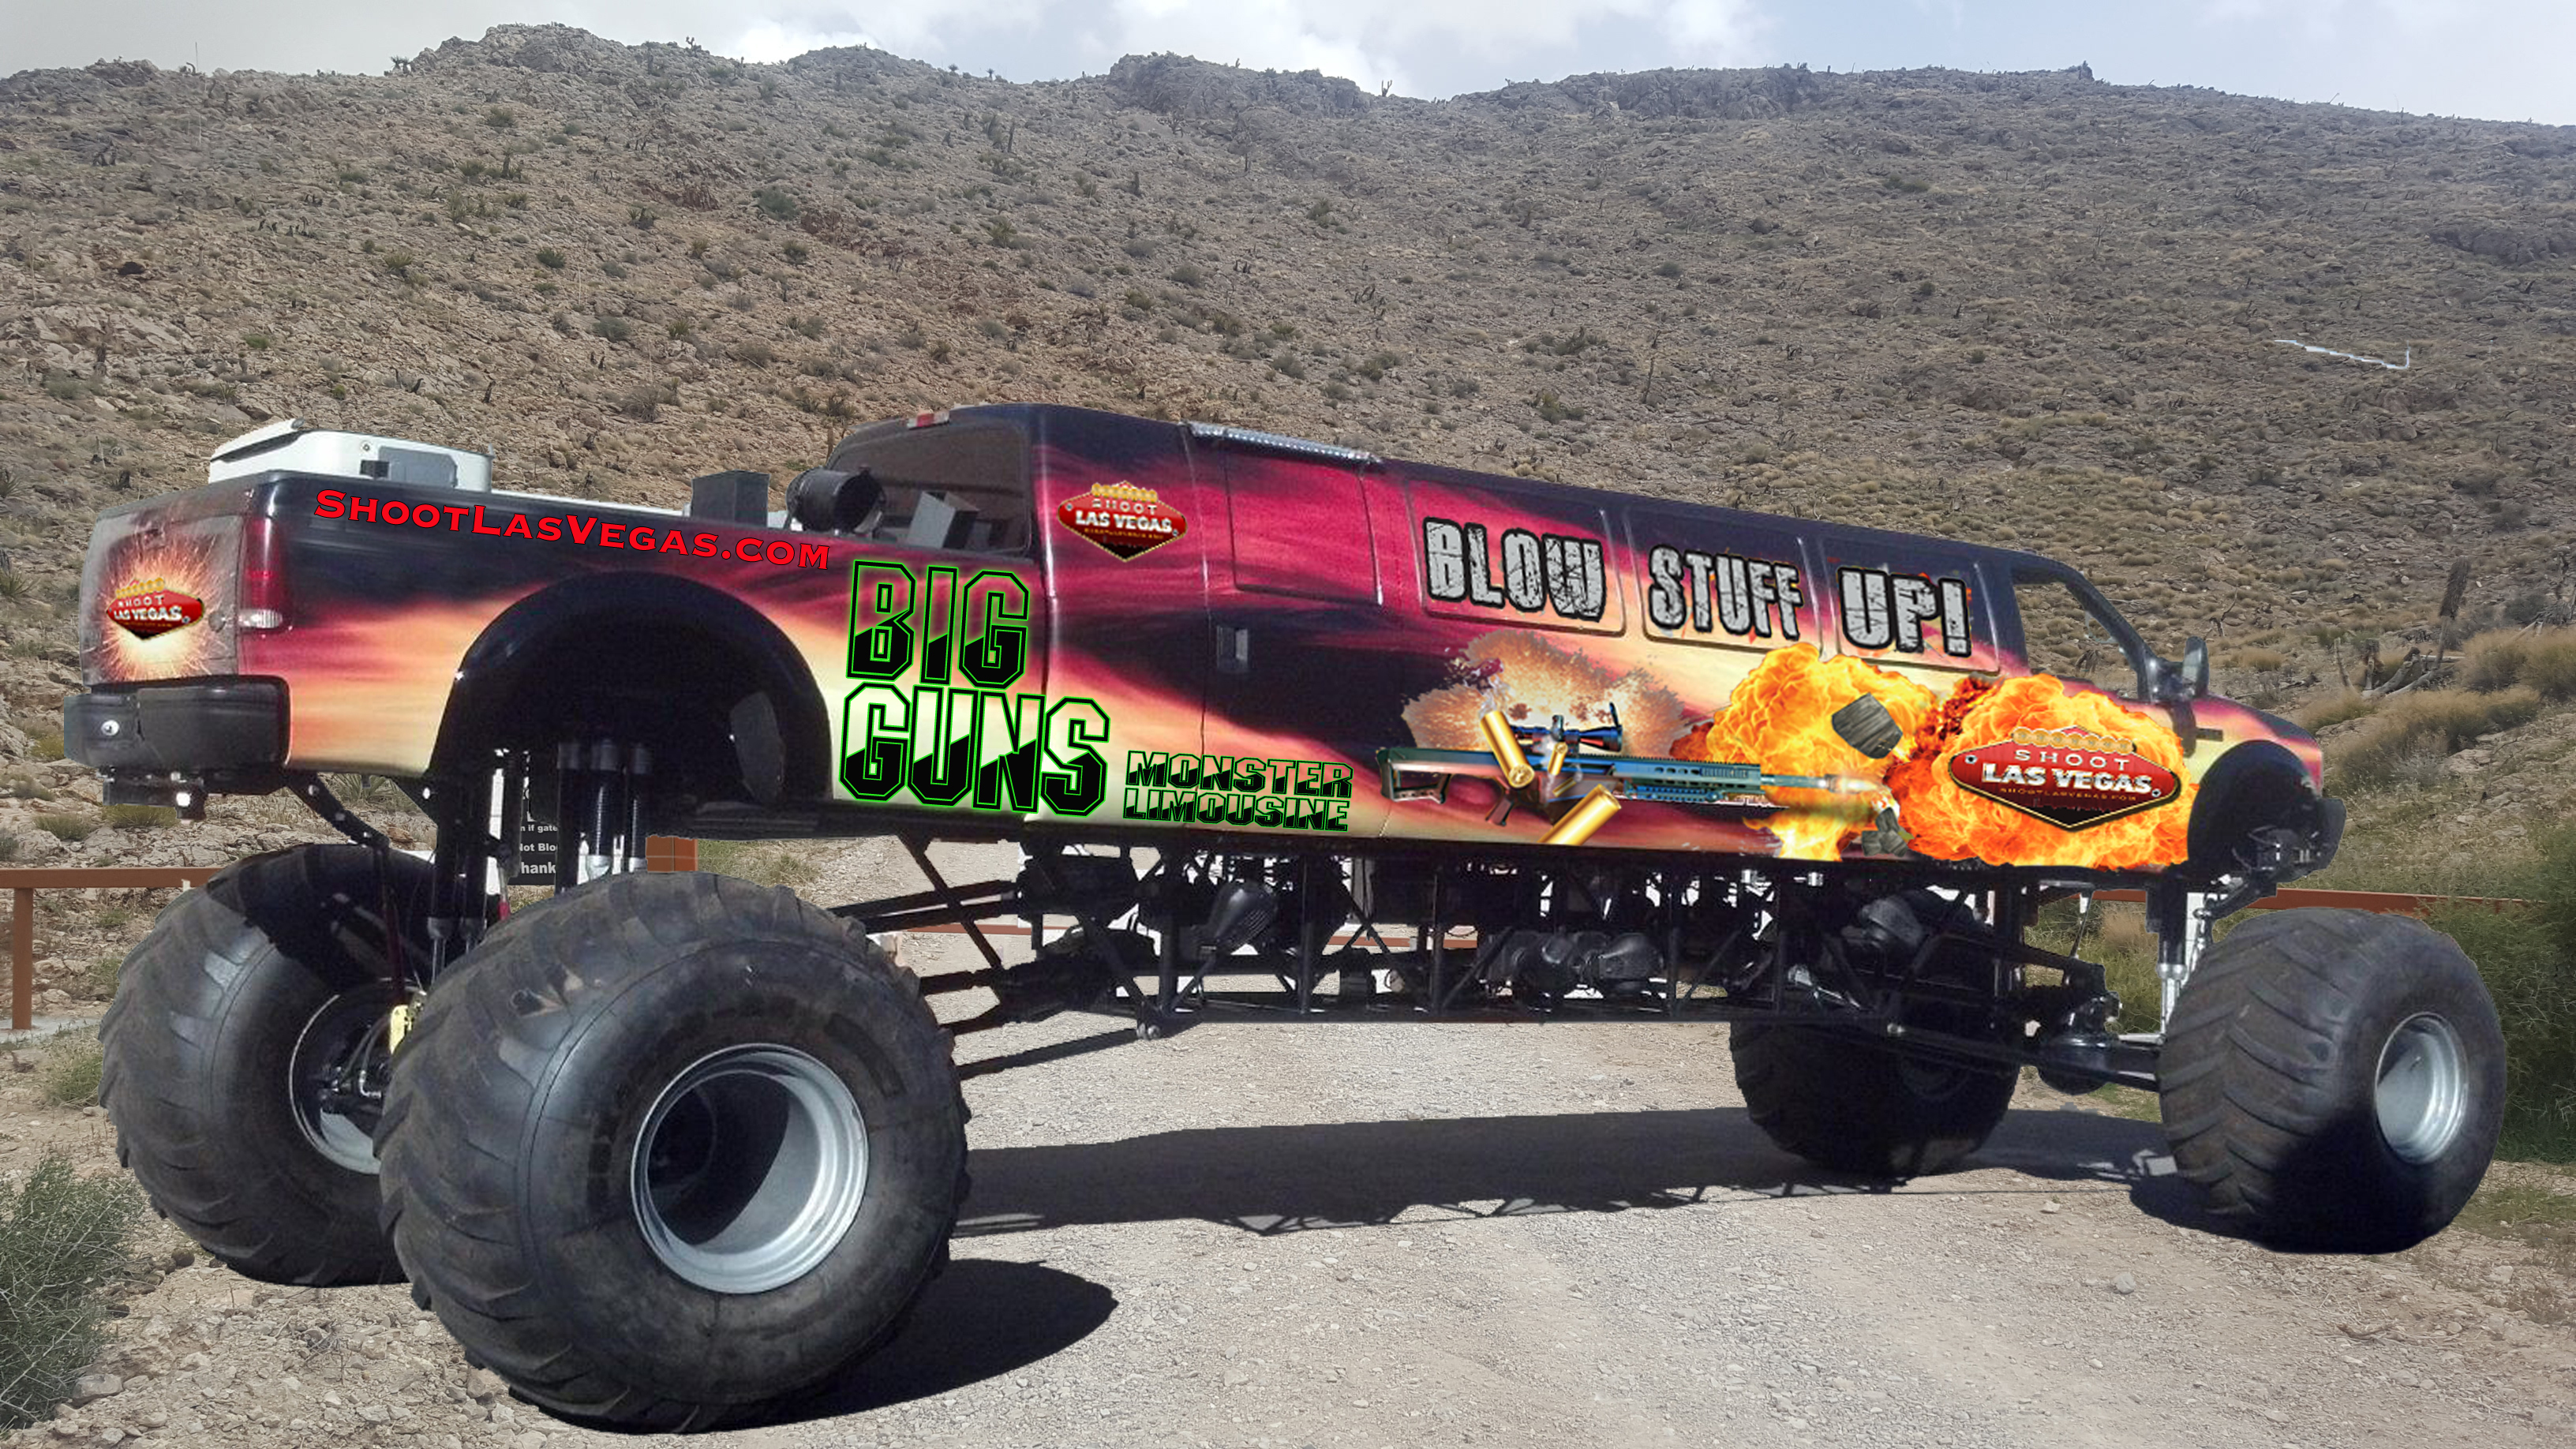 World's longest monster truck to hit trade show circuit | Medium ...